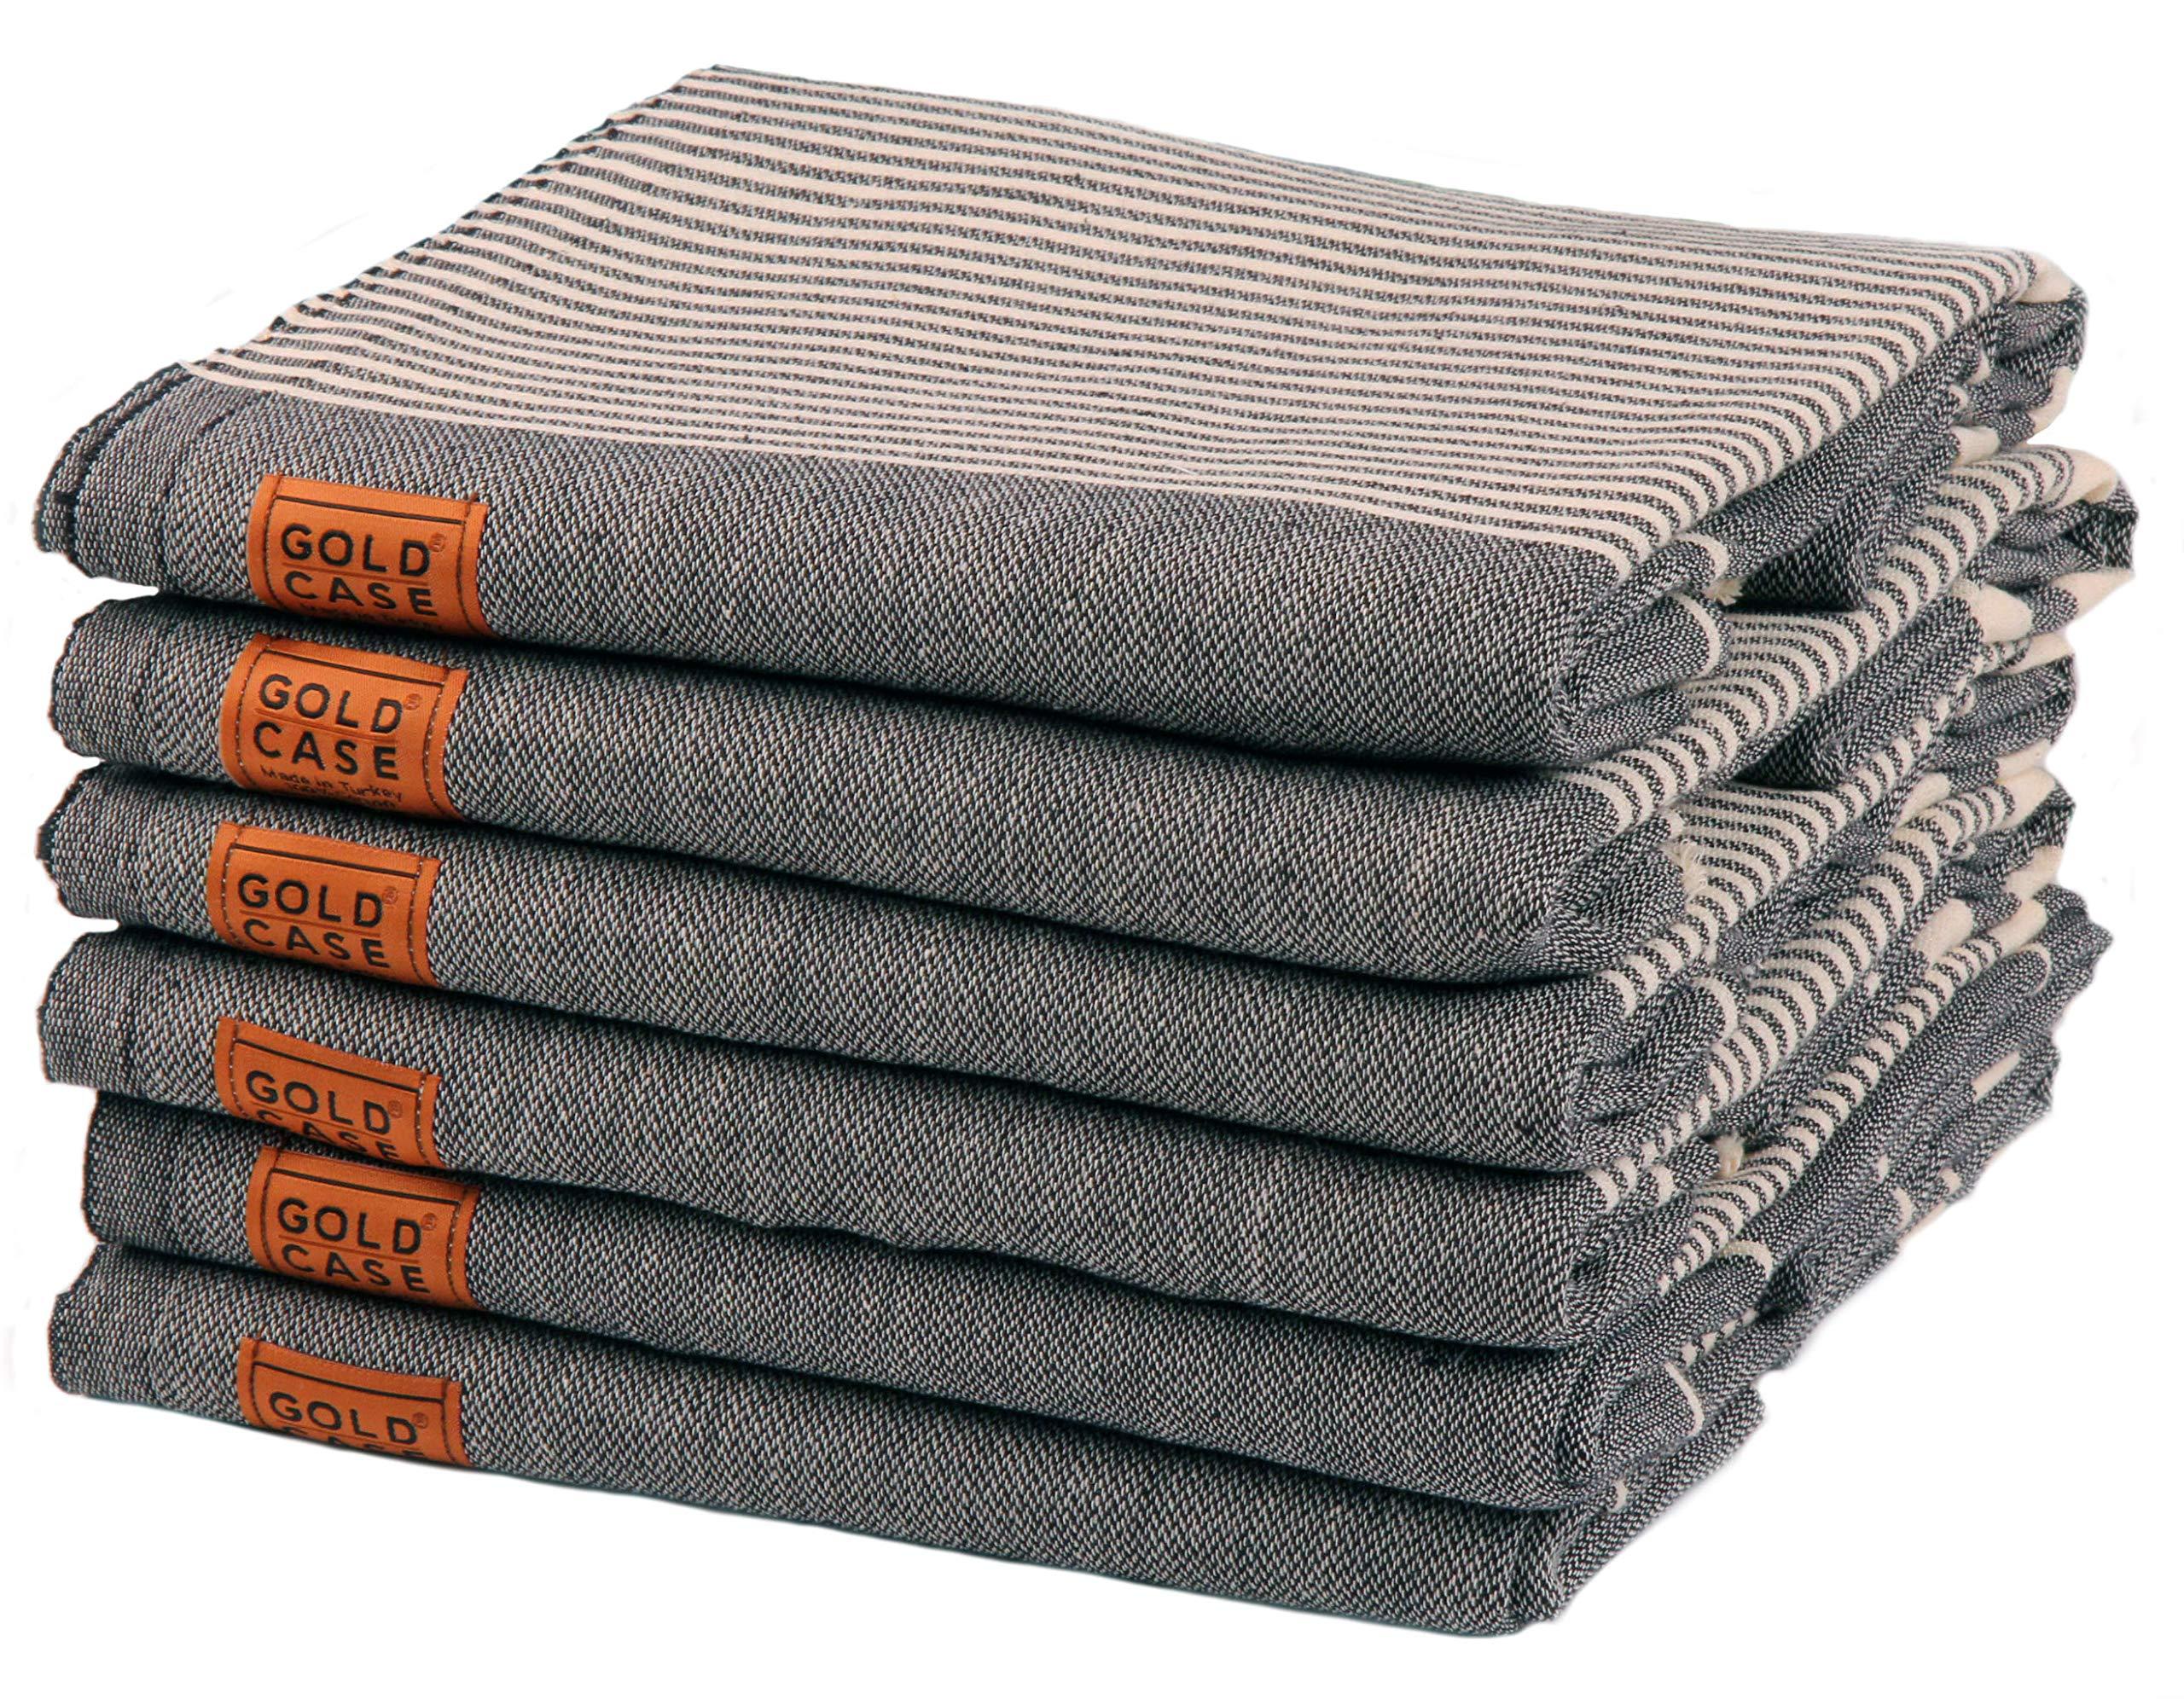 Gold Case Set of 6 XXL Hera Pestemal Towels Turkish Cotton Bath Beach Hammam Towel Peshtemal Throw Blanket (Black)